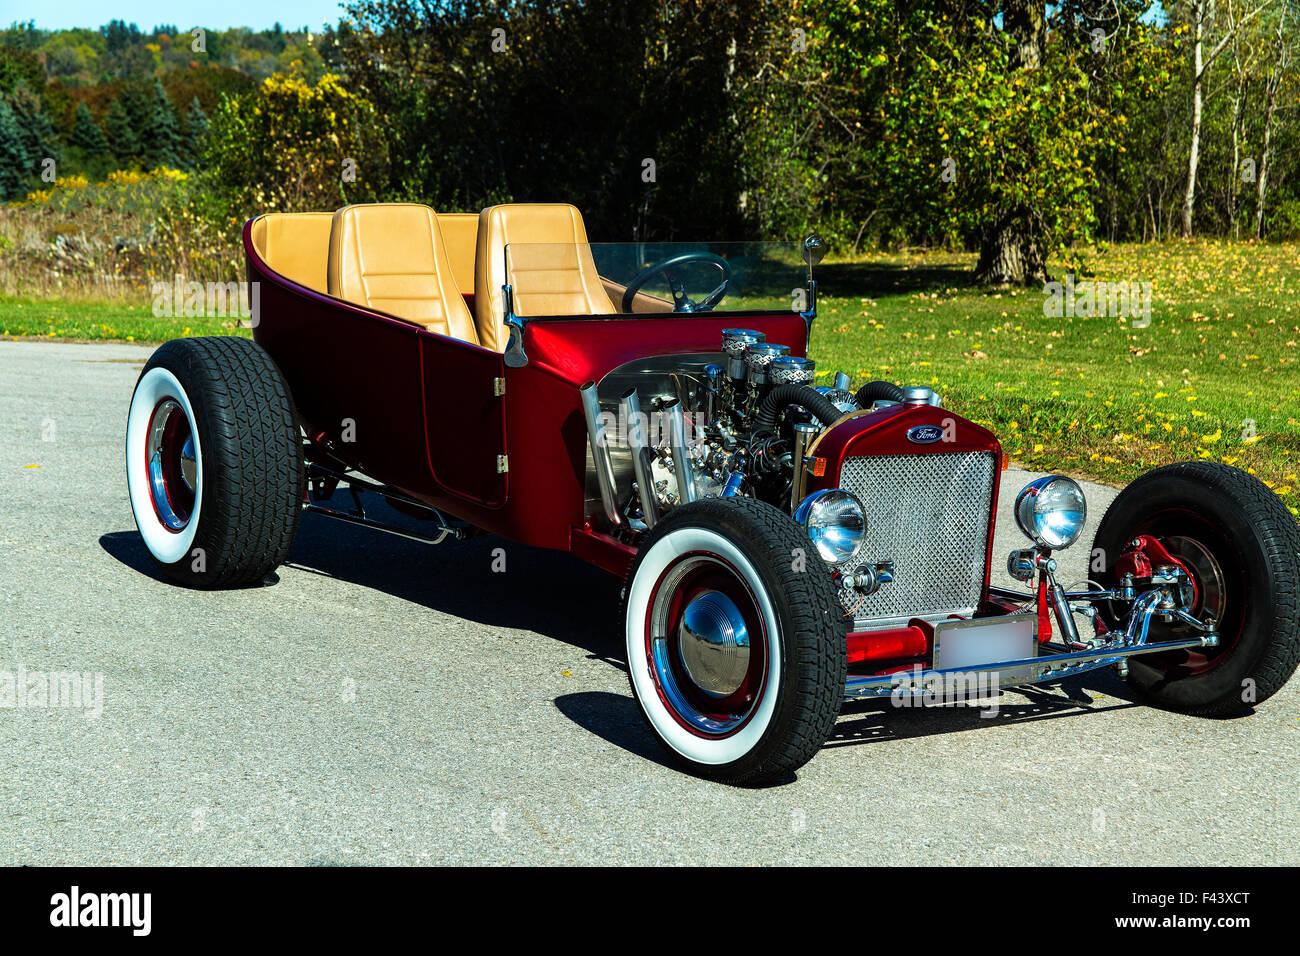 1923 Ford Model T Custom Hot Rod Stock Photo: 88597064 - Alamy